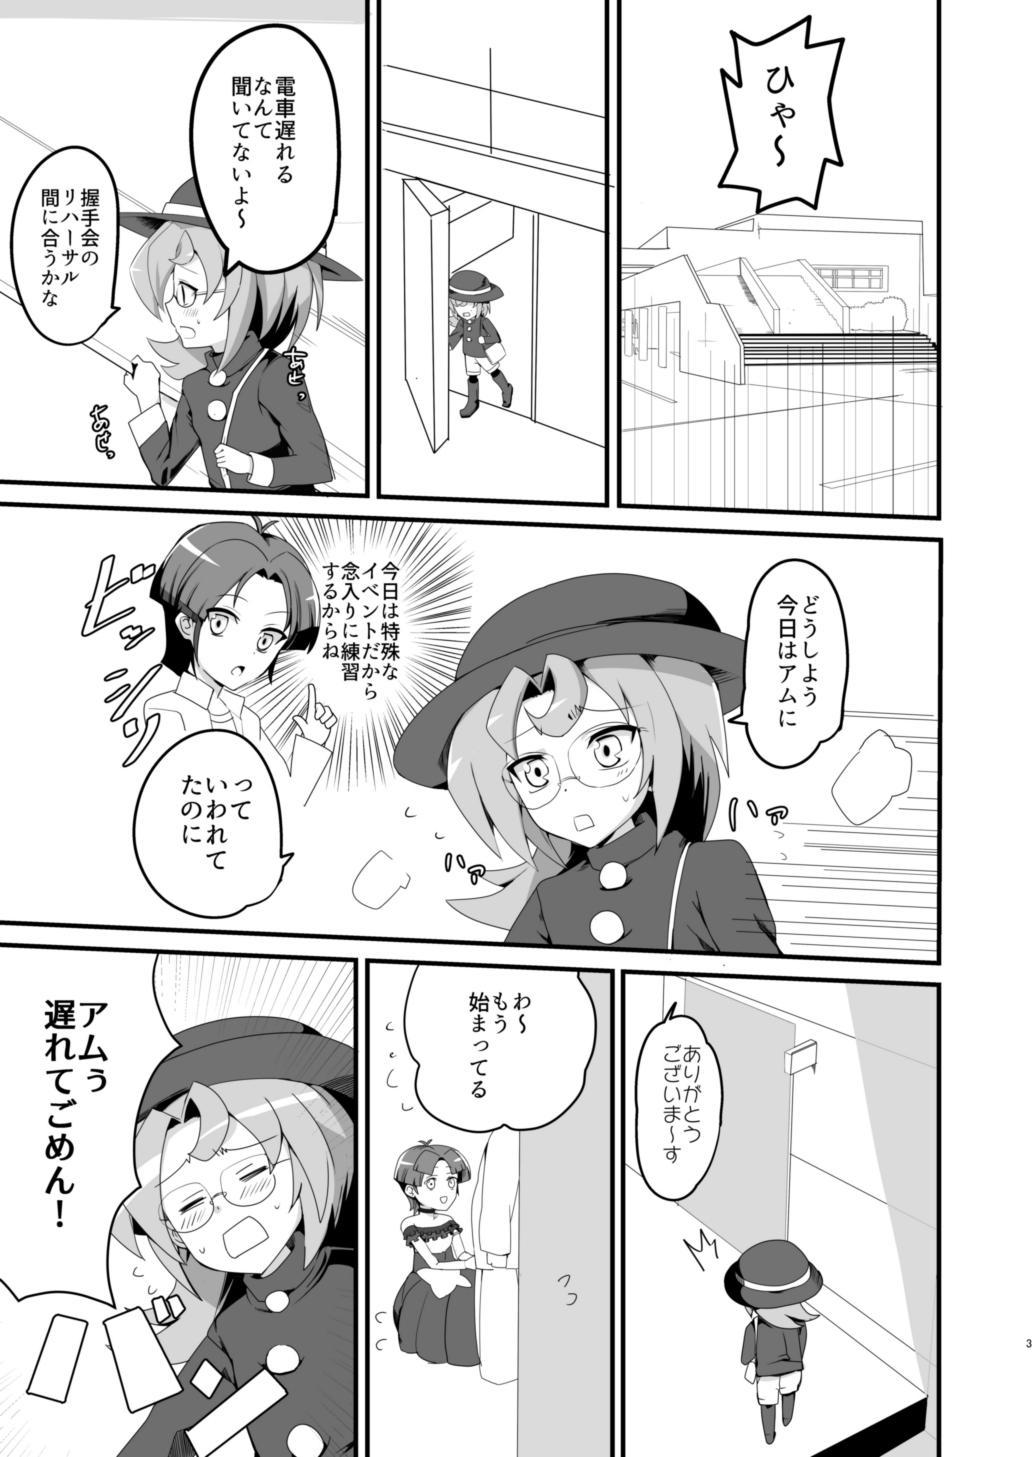 LunaAm O♂n♂n Akushuukai 1